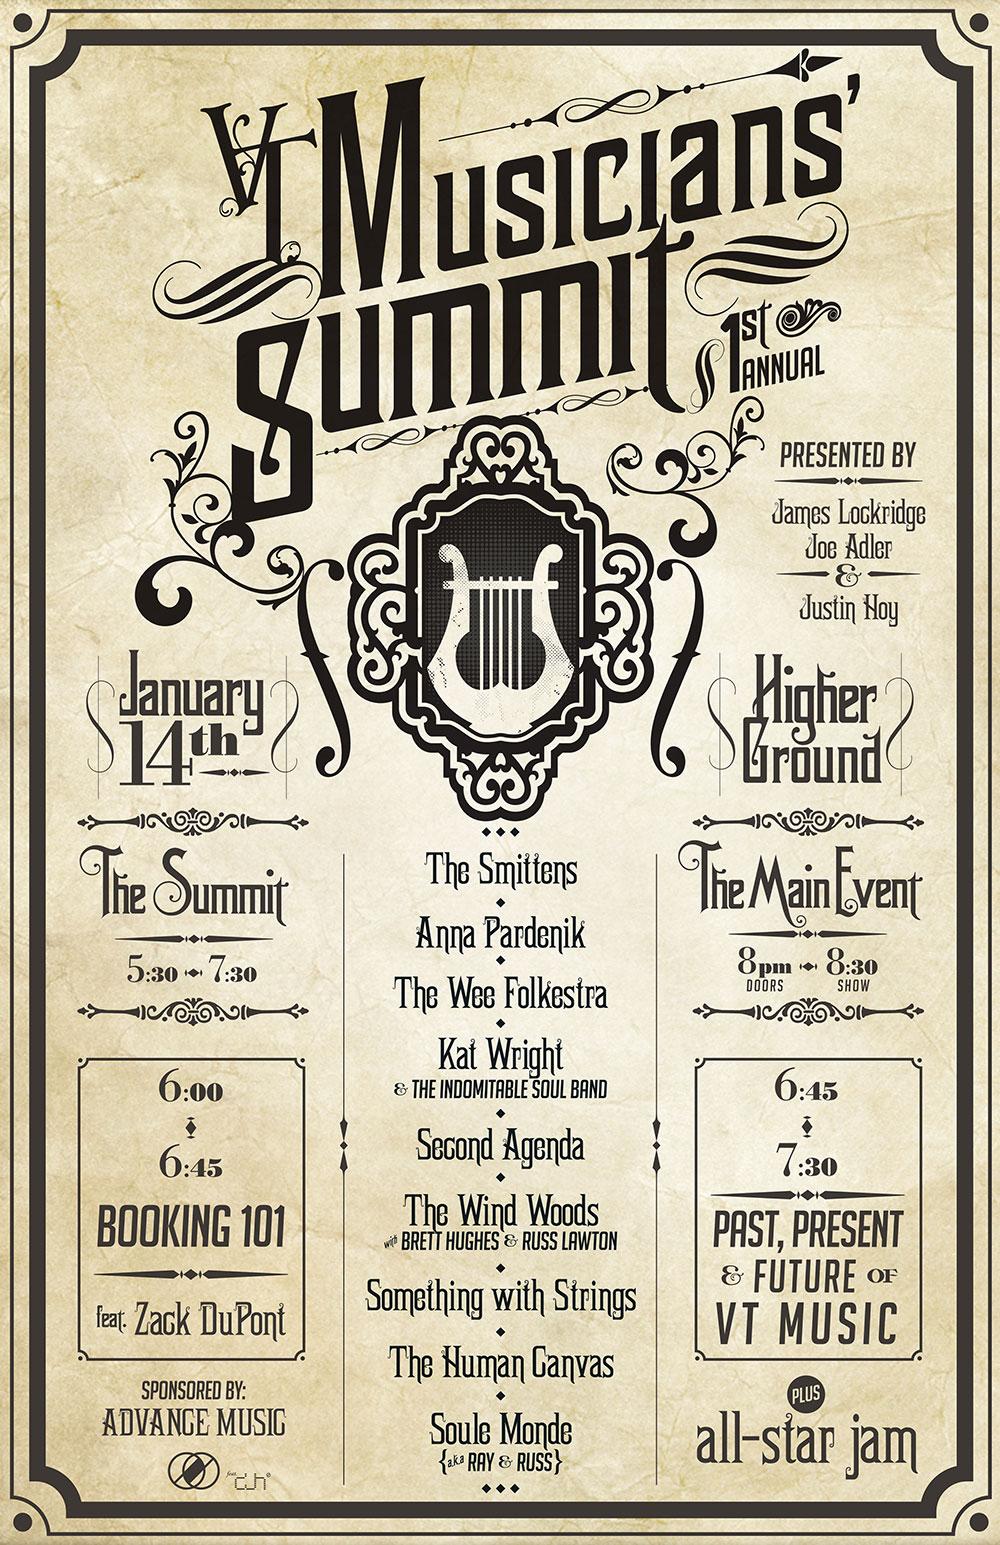 2012 Music Summit